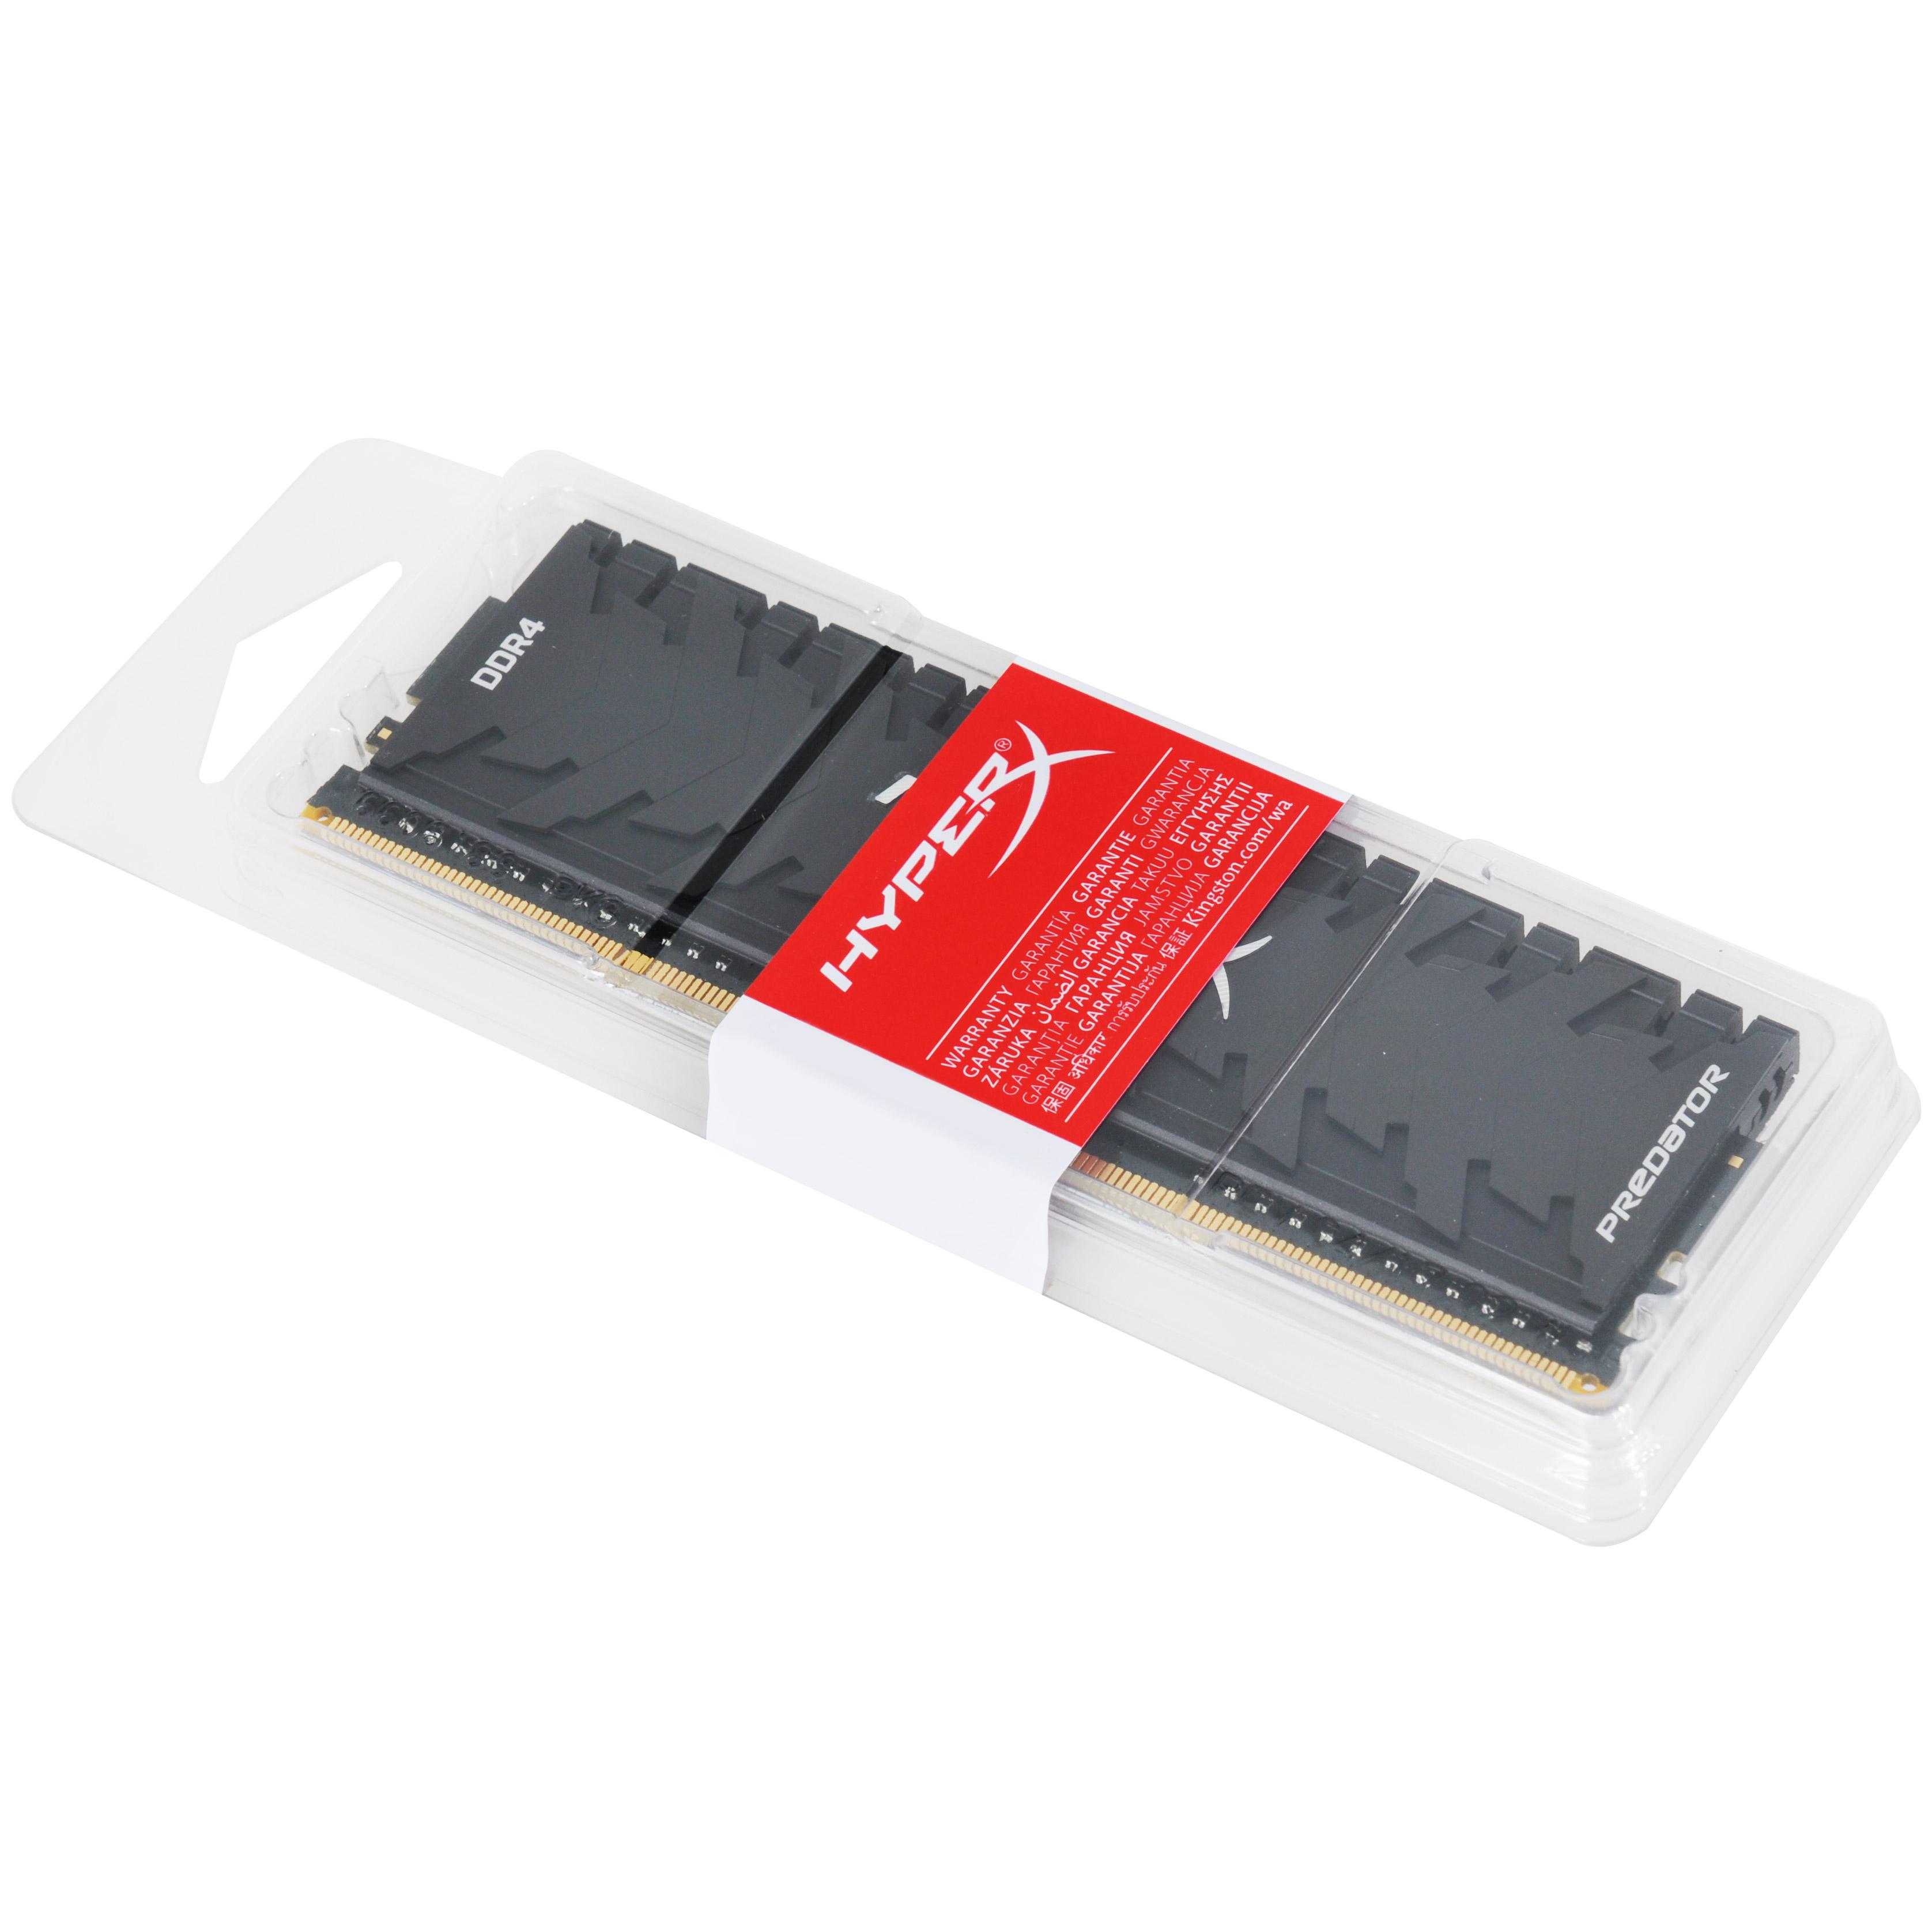 HX432C16PB3/16 DDR4 16 GB, 3200 MHz, CL16, XMP HyperX Predator